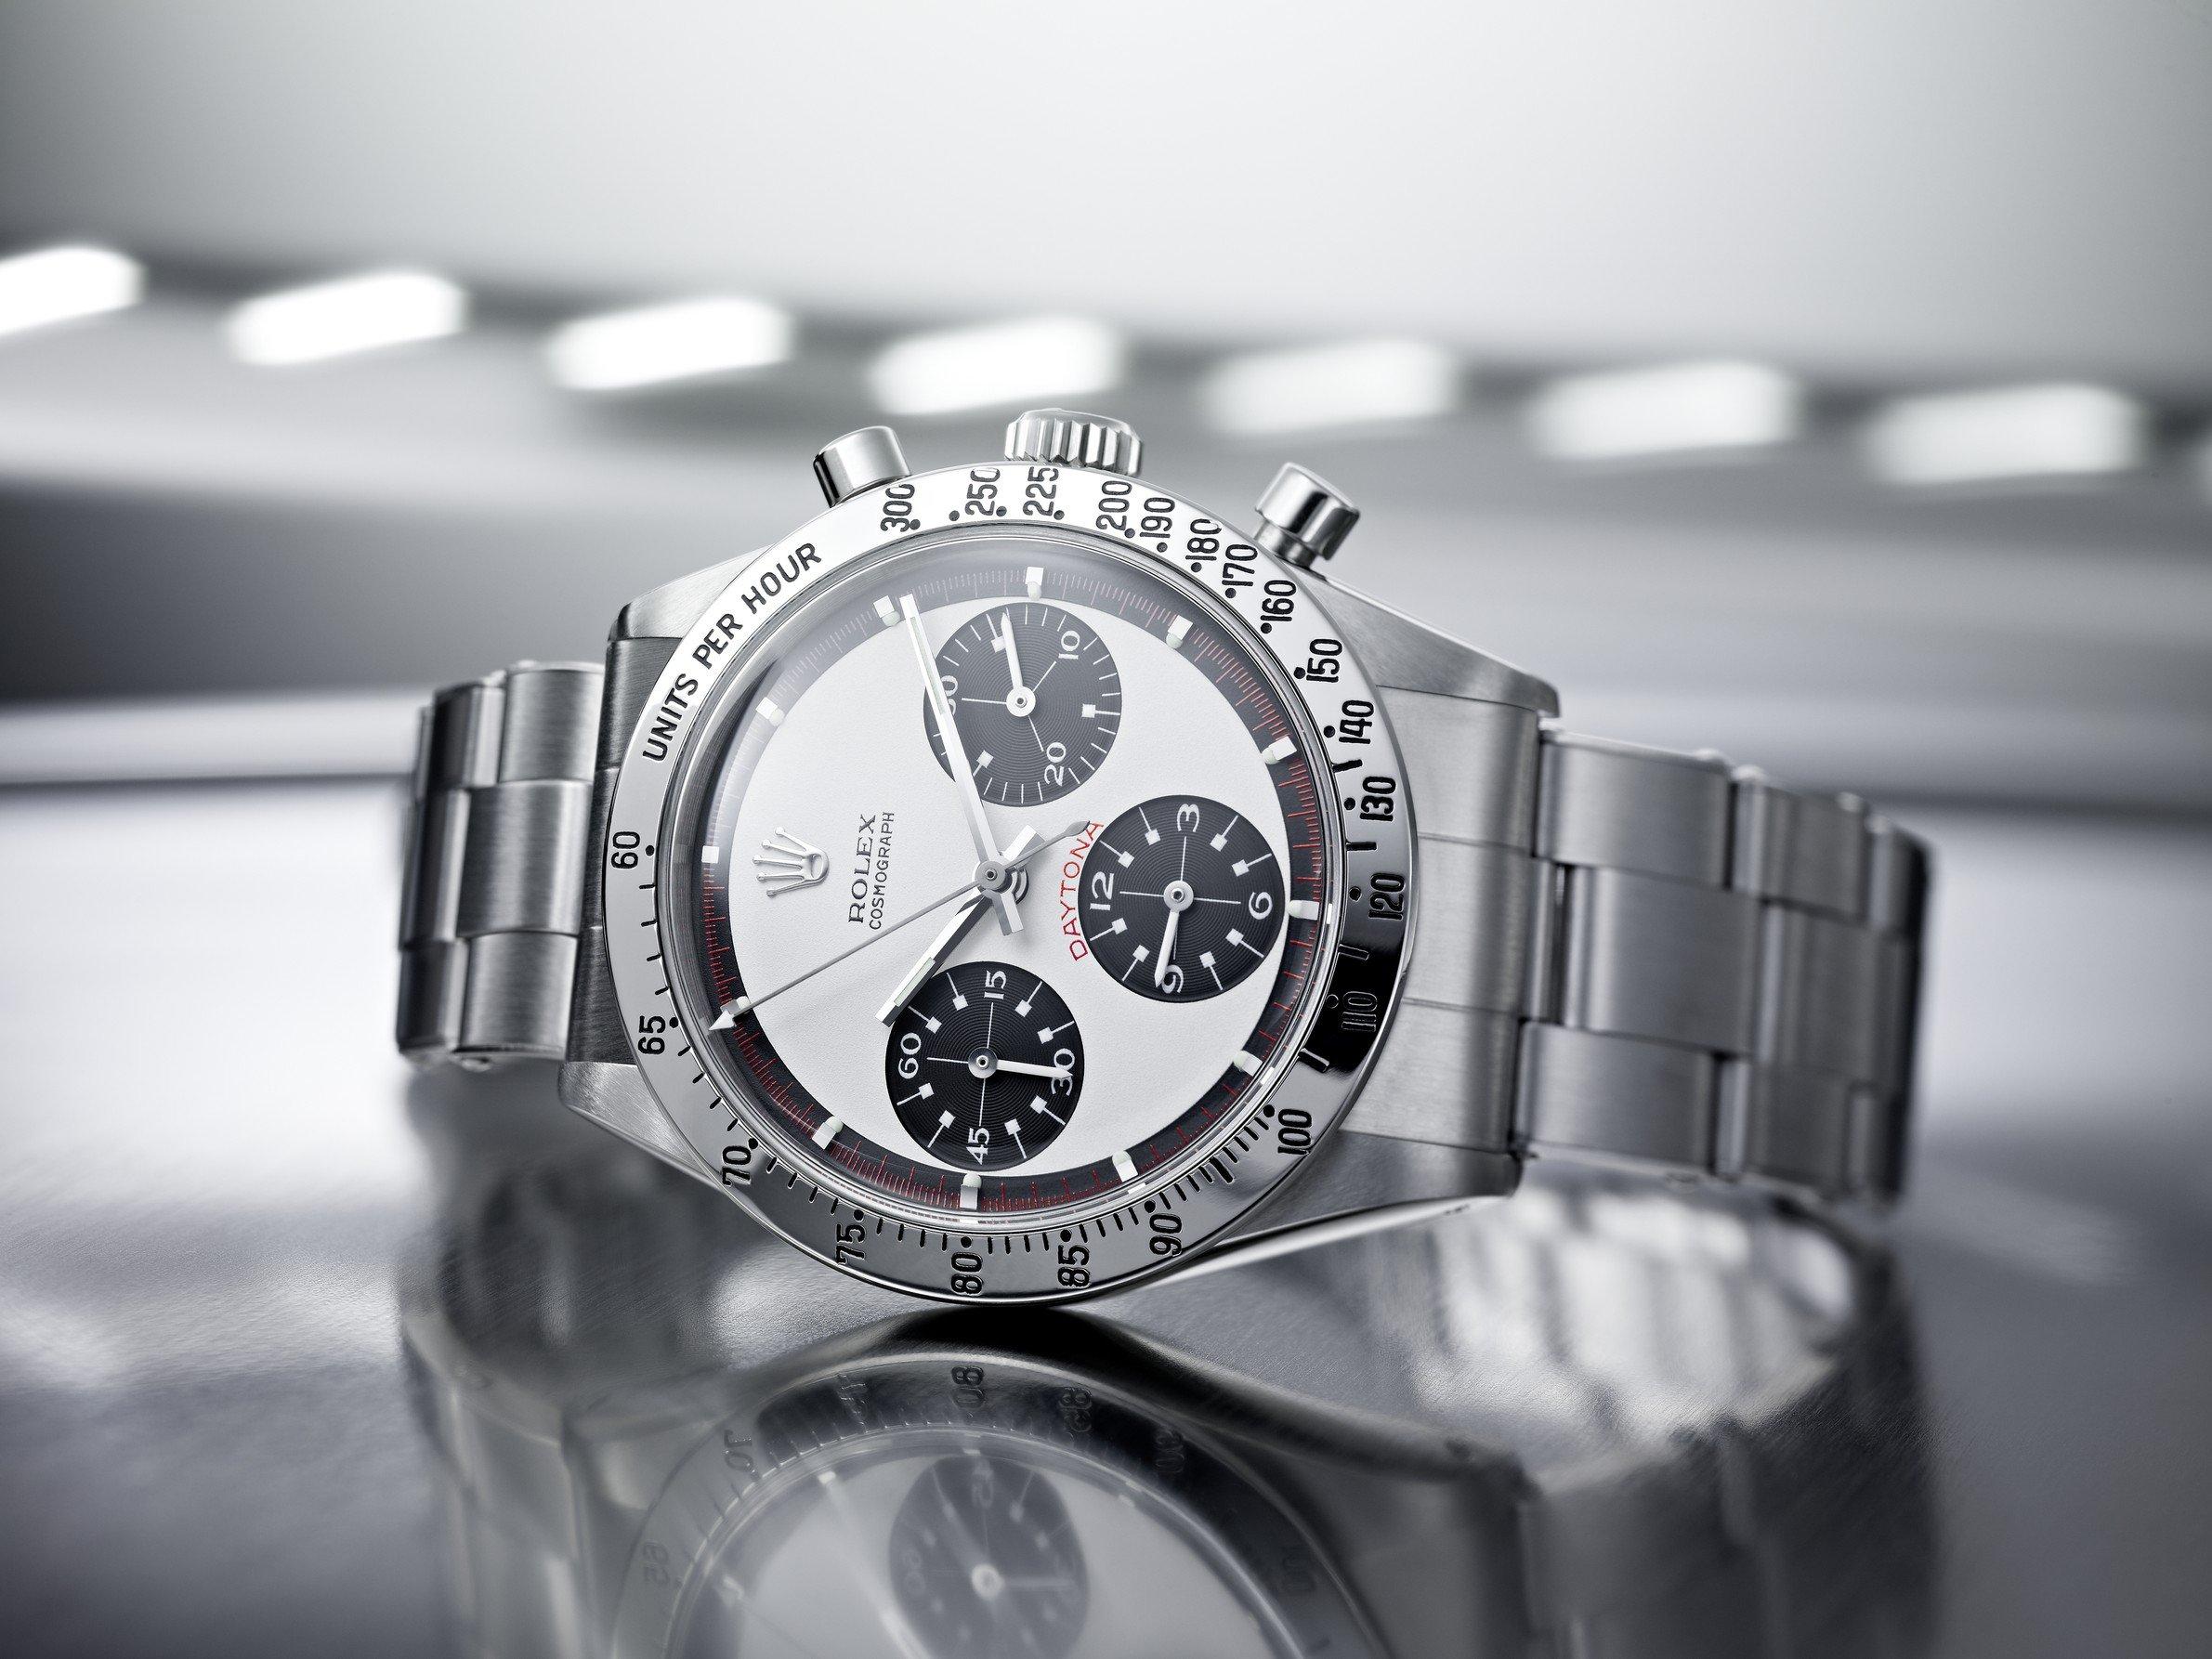 Rolex Cosmograph_Daytona_Paul_Newman_Dial